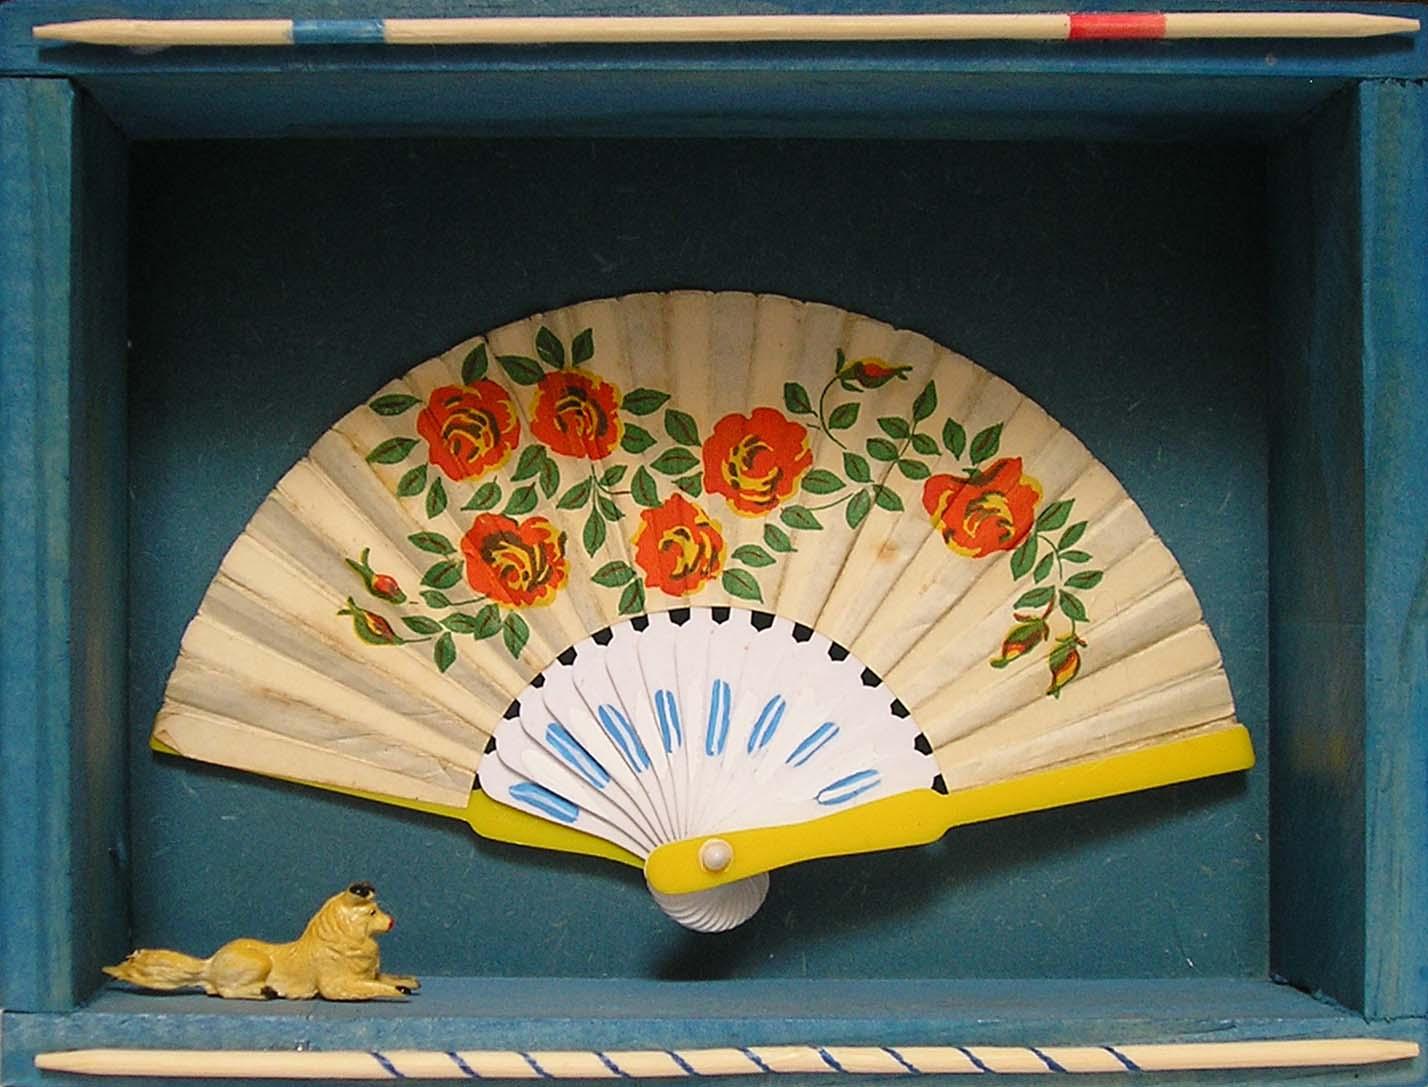 Aires de Cambio IV, serie, objetos, ensamblados, 2003